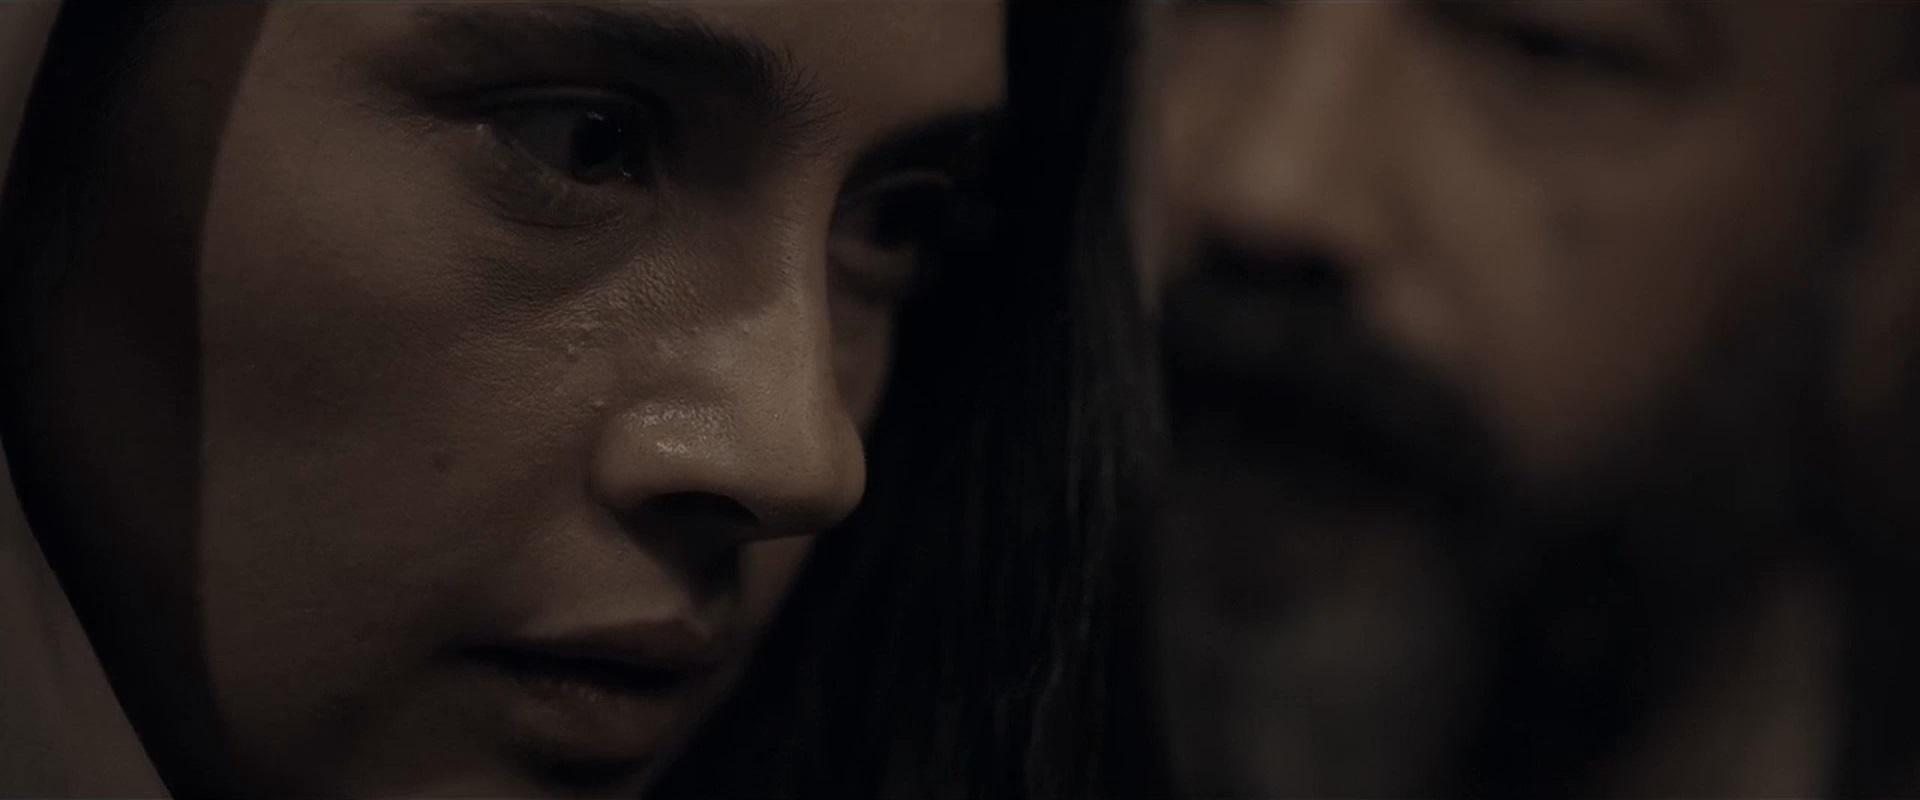 Aden | 2019 | Yerli Film | WEB-DL | XviD | Sansürsüz | 1080p - m720p - m1080p | WEB-DL | Tek Link